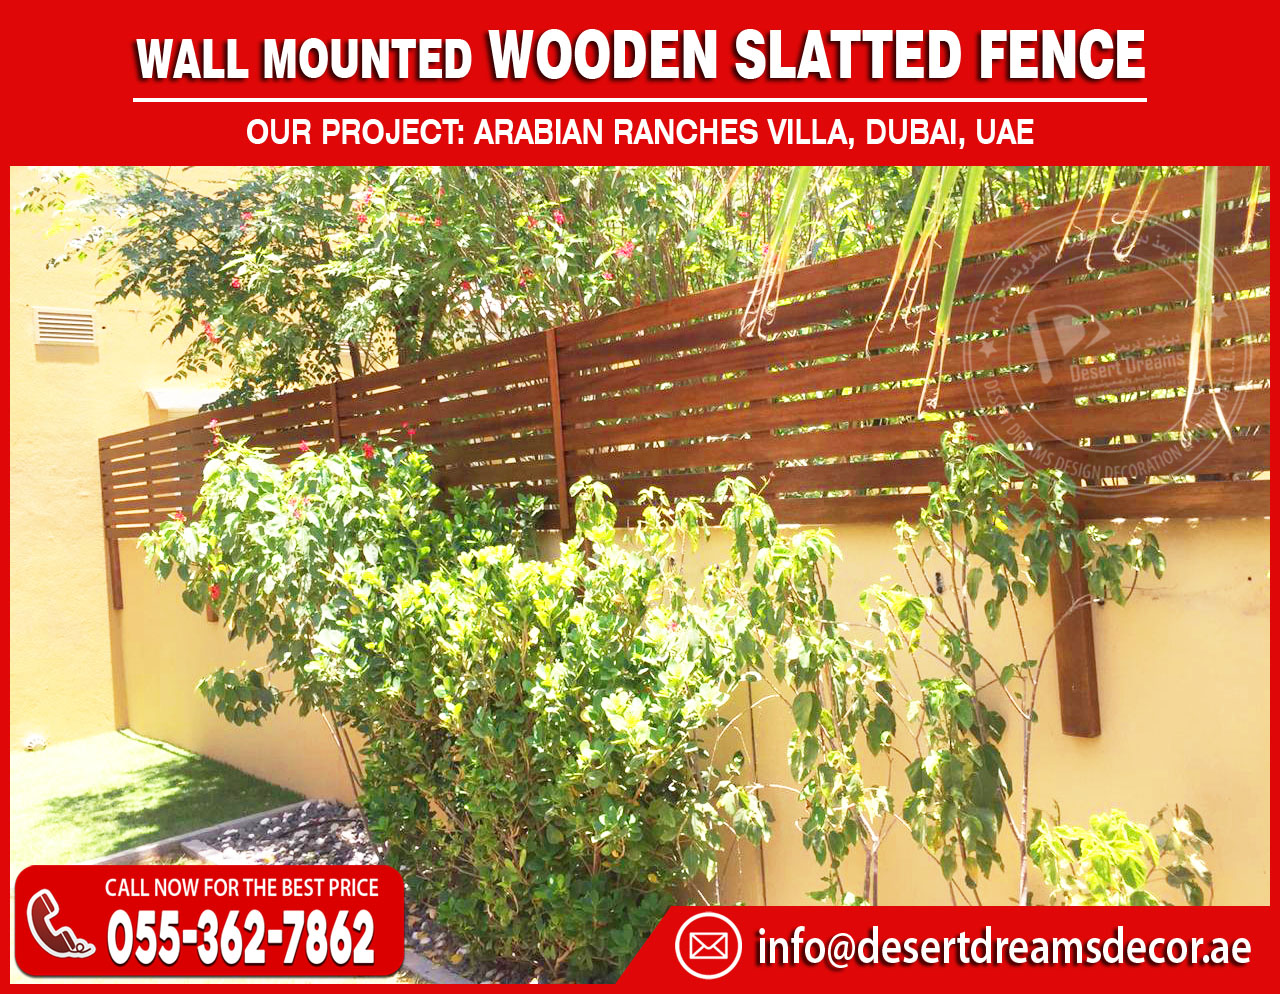 Wall Mounted Wooden Slatted Fences in UAE.jpg